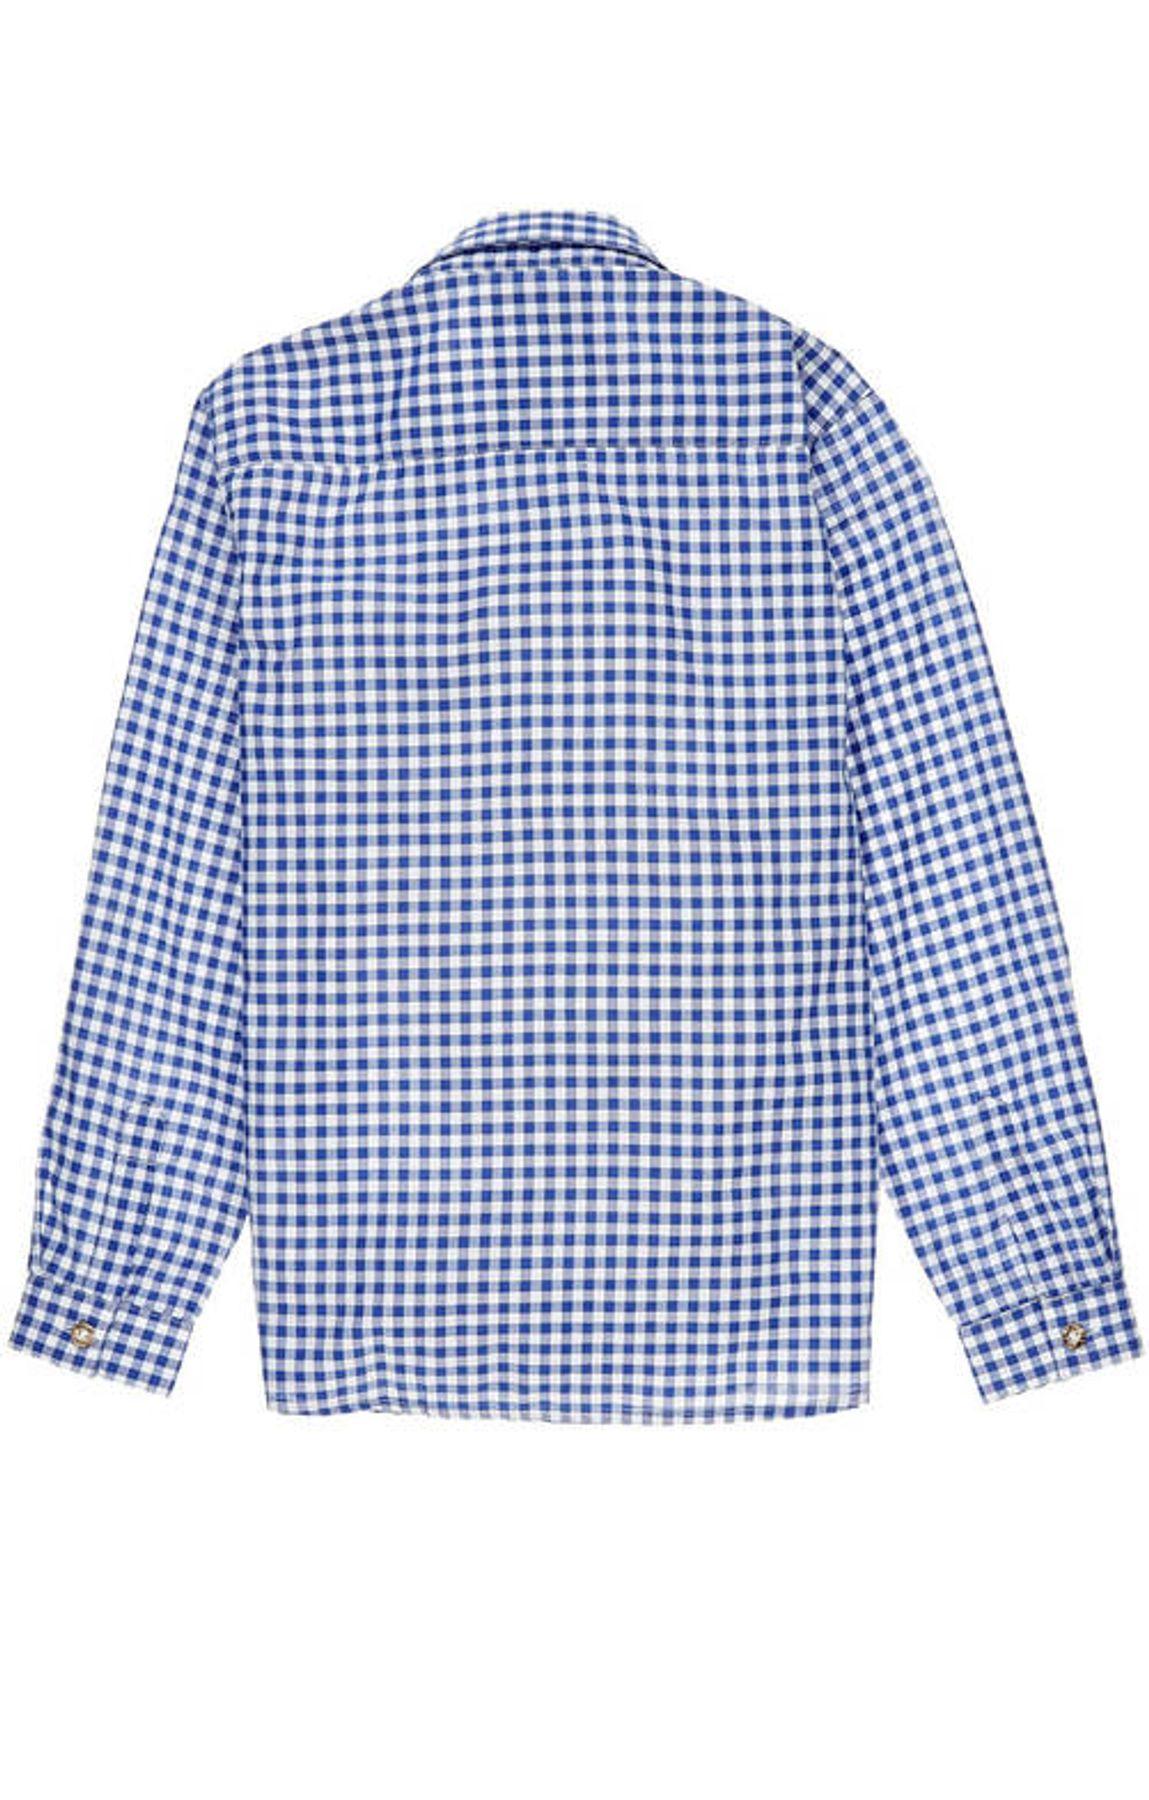 Stockerpoint - Kinder Trachten Hemd Leo, Gr. 86-116 – Bild 10